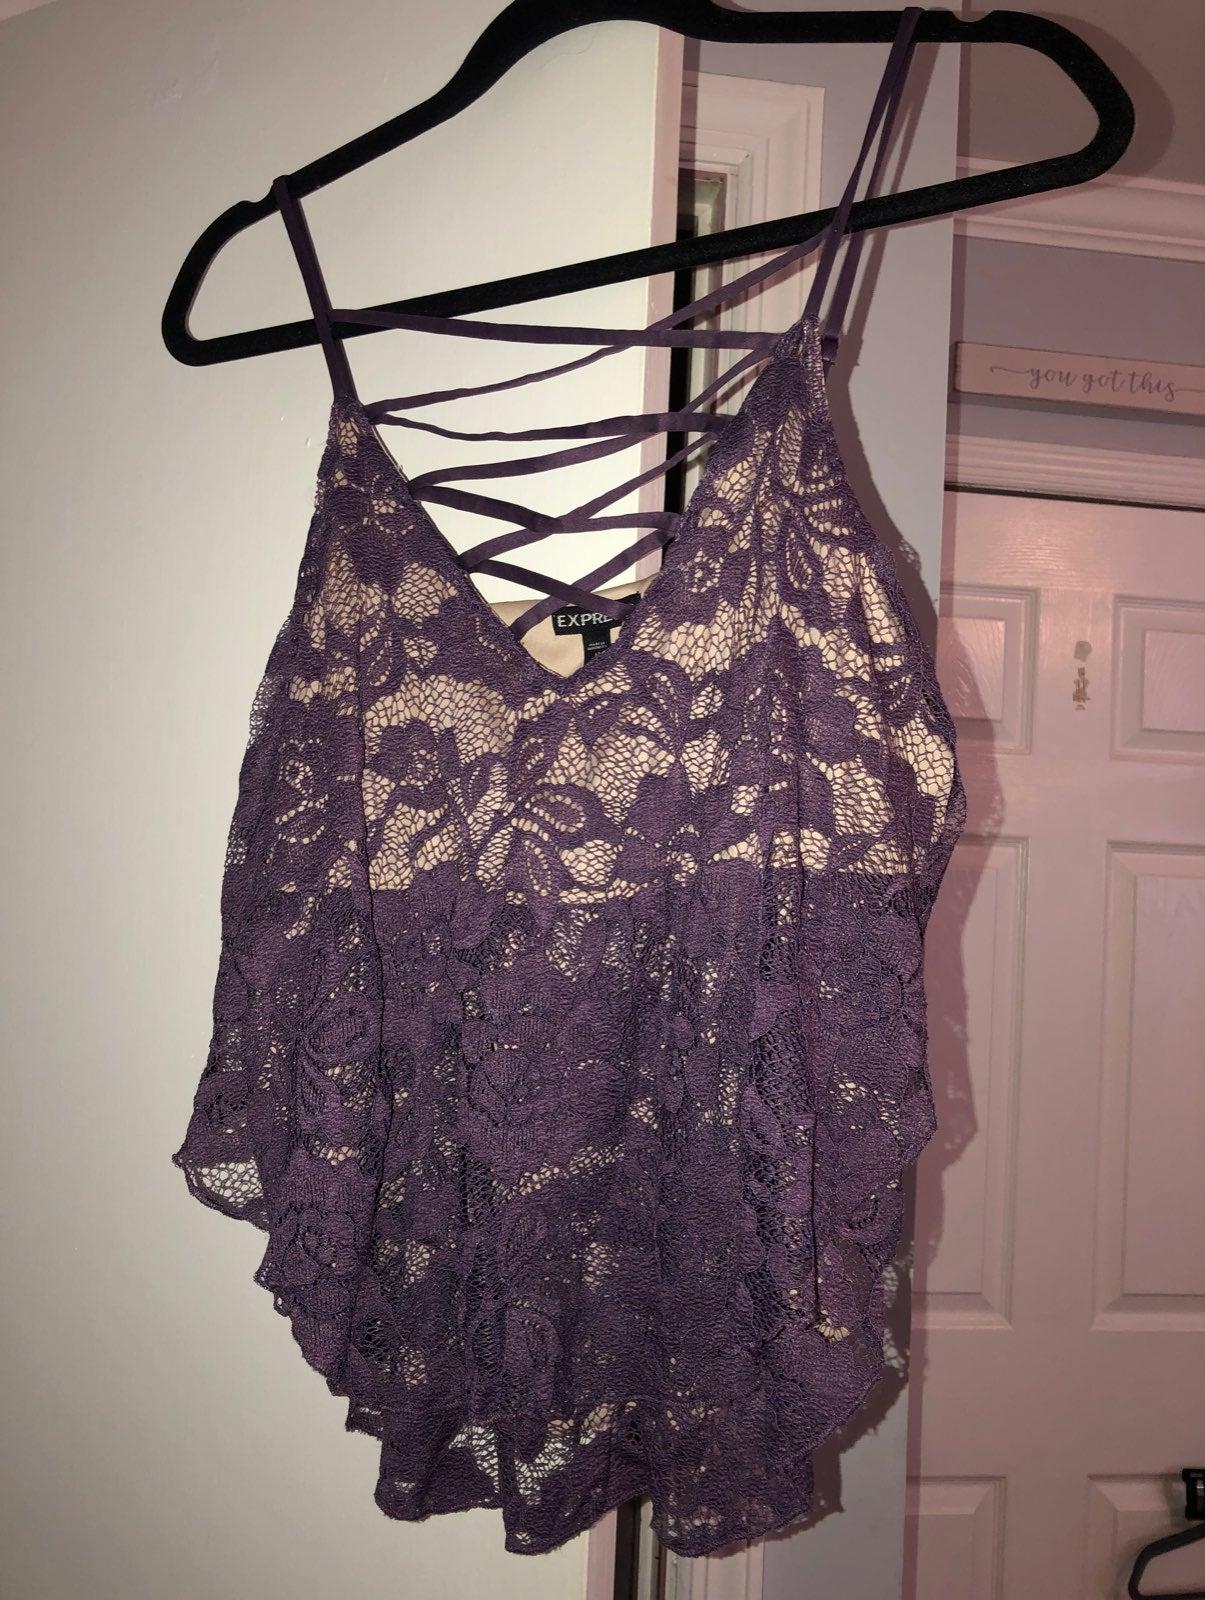 Crisscross lace tanktop blouse